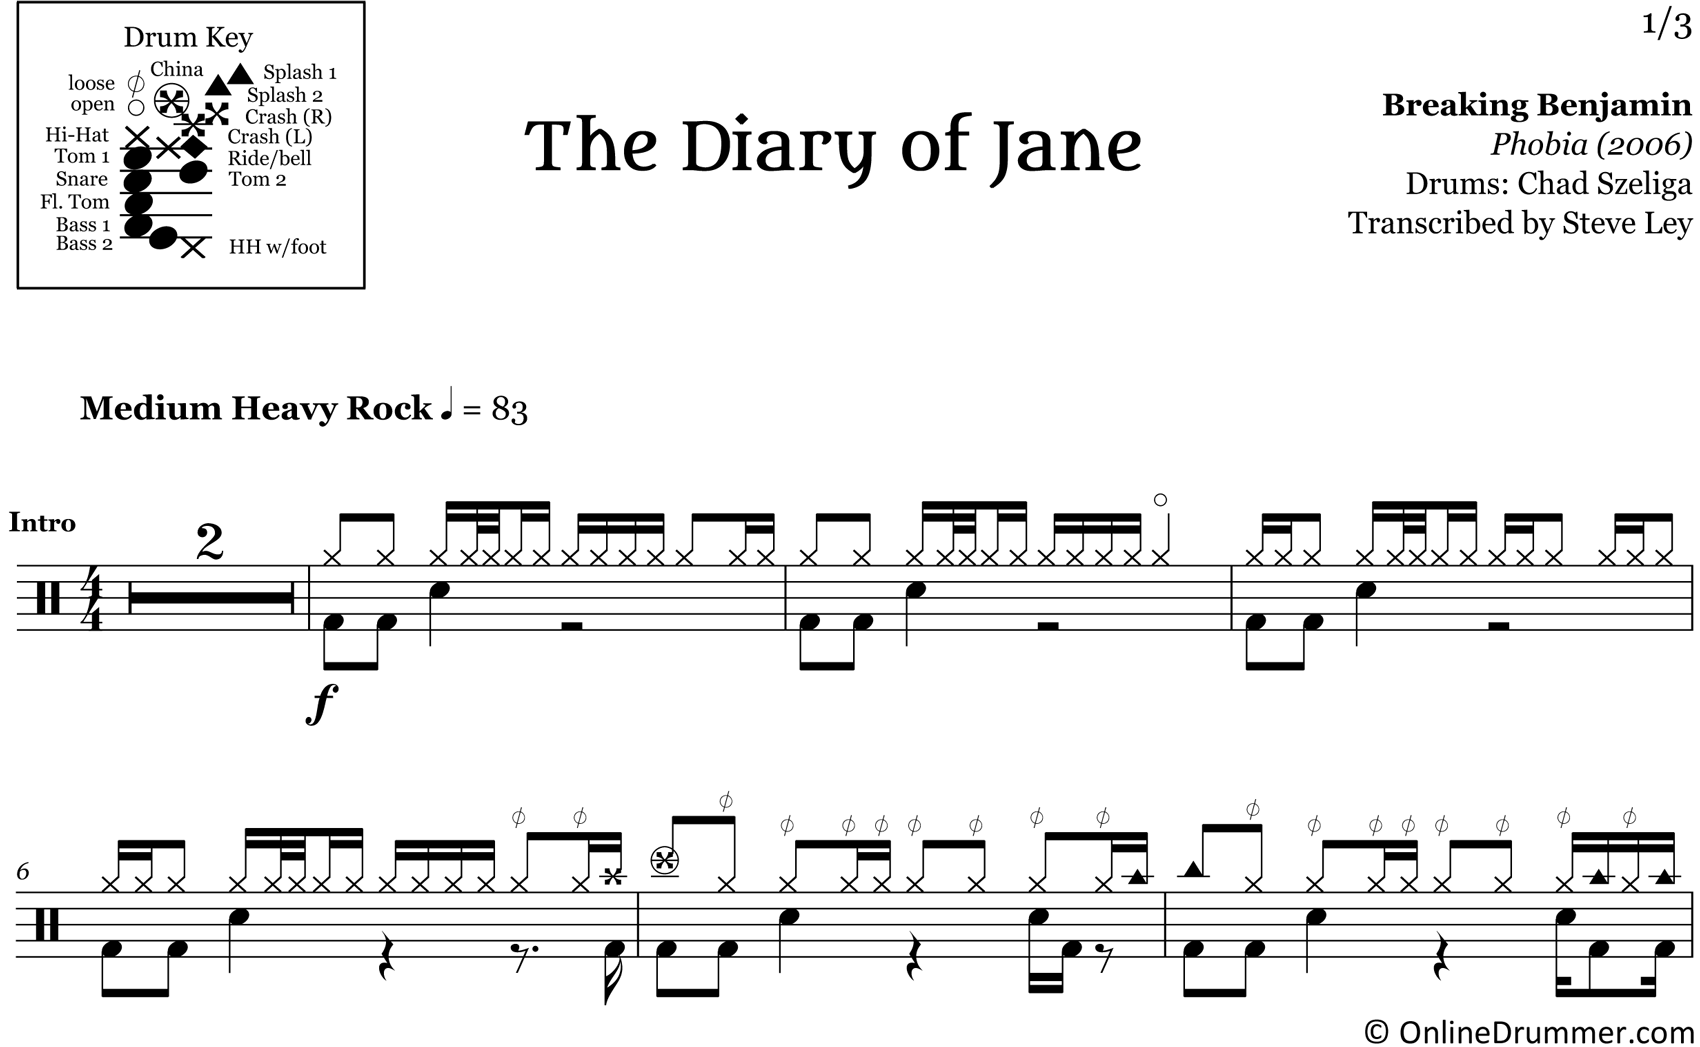 The Diary of Jane - Breaking Benjamin - Drum Sheet Music